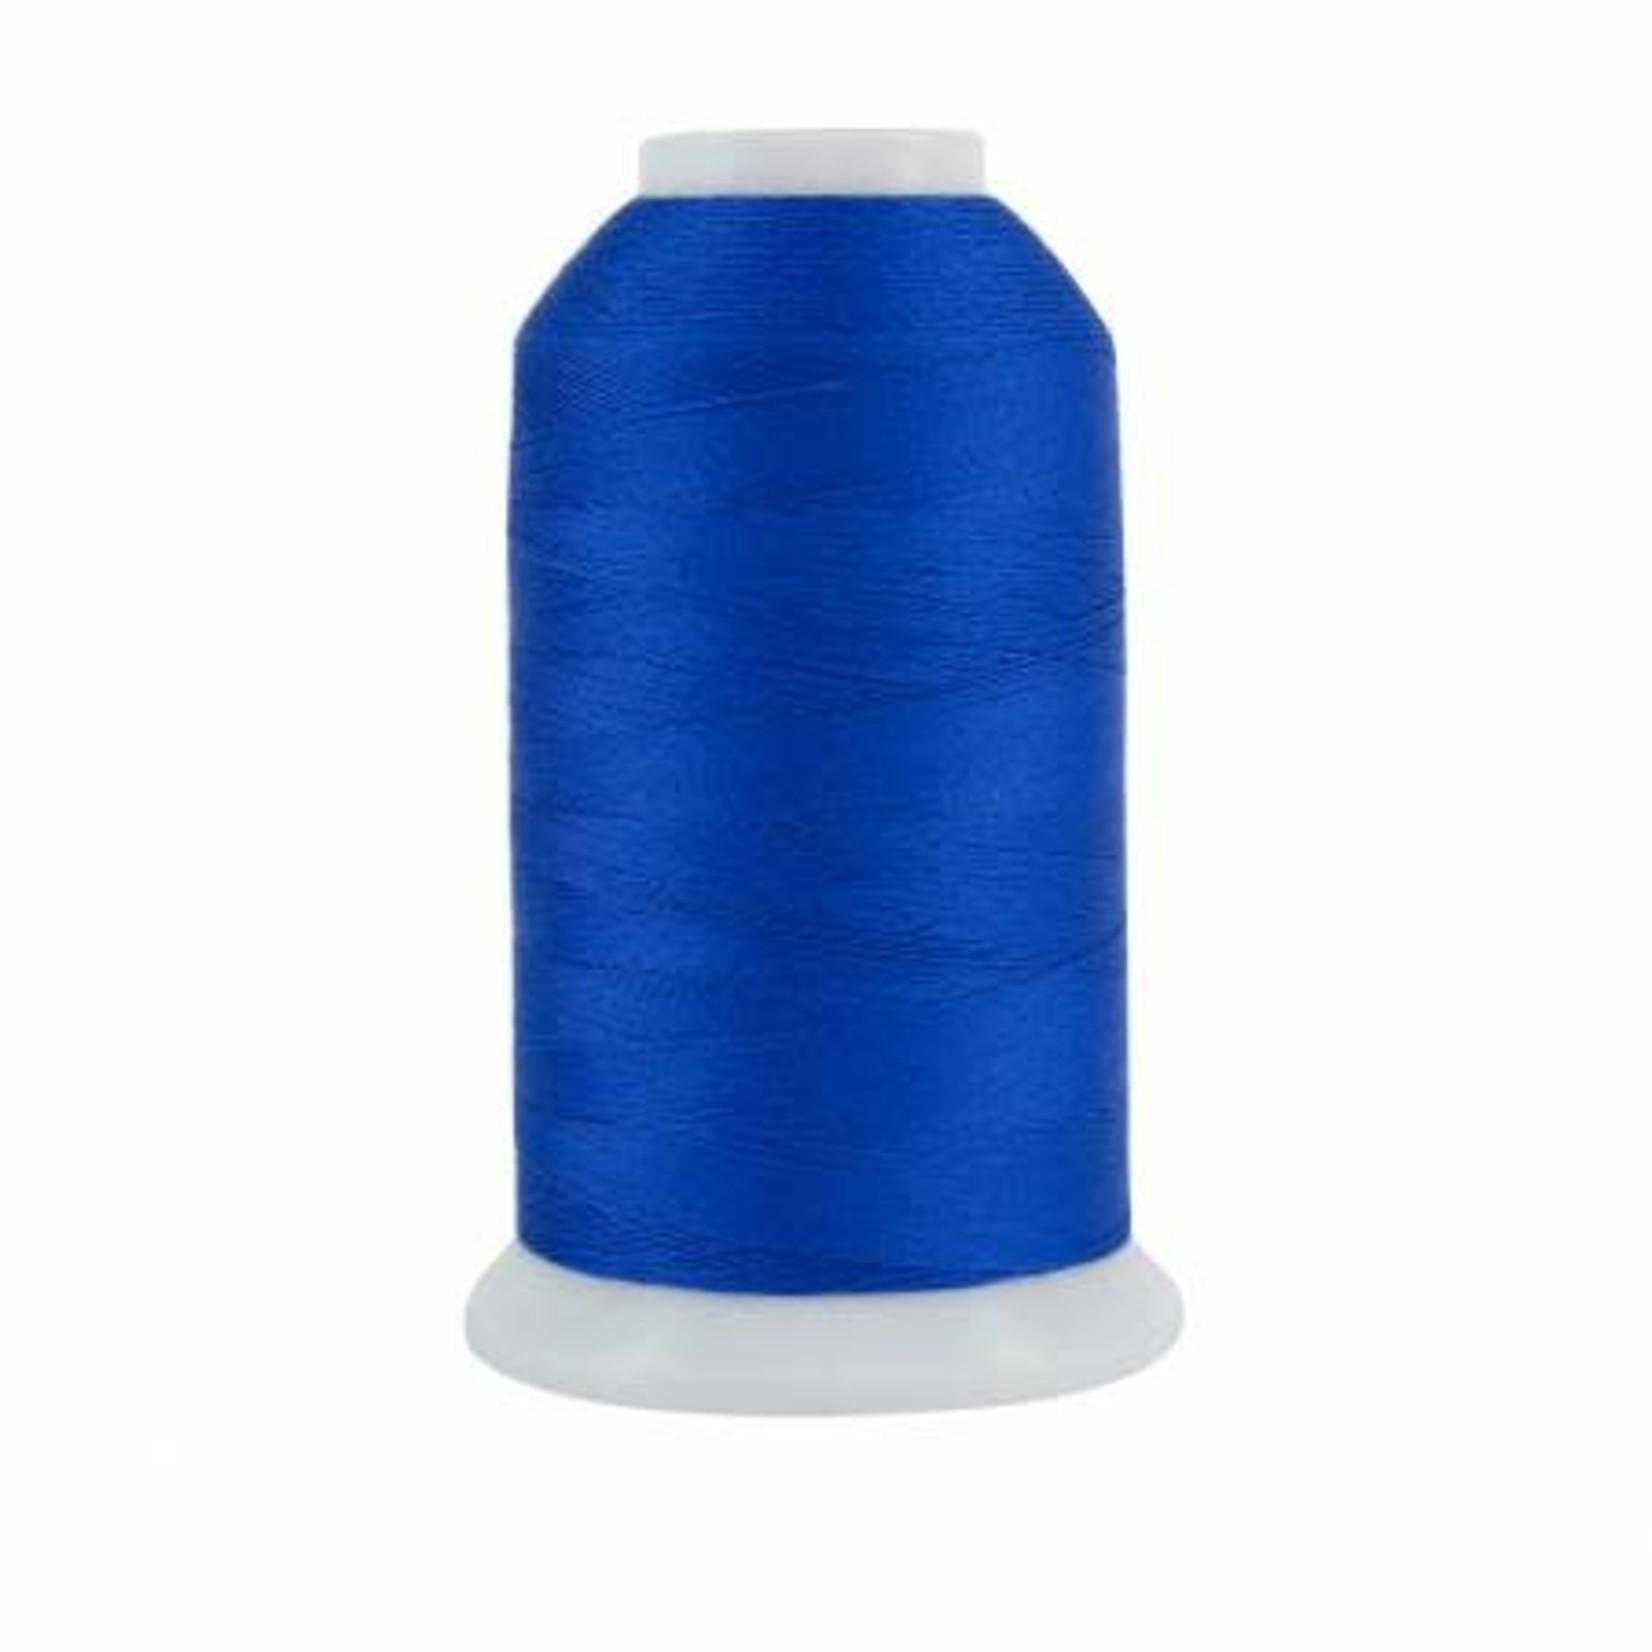 Superior Threads King Tut - #40 - 1828 m - 1035 Dark B.B. Blue